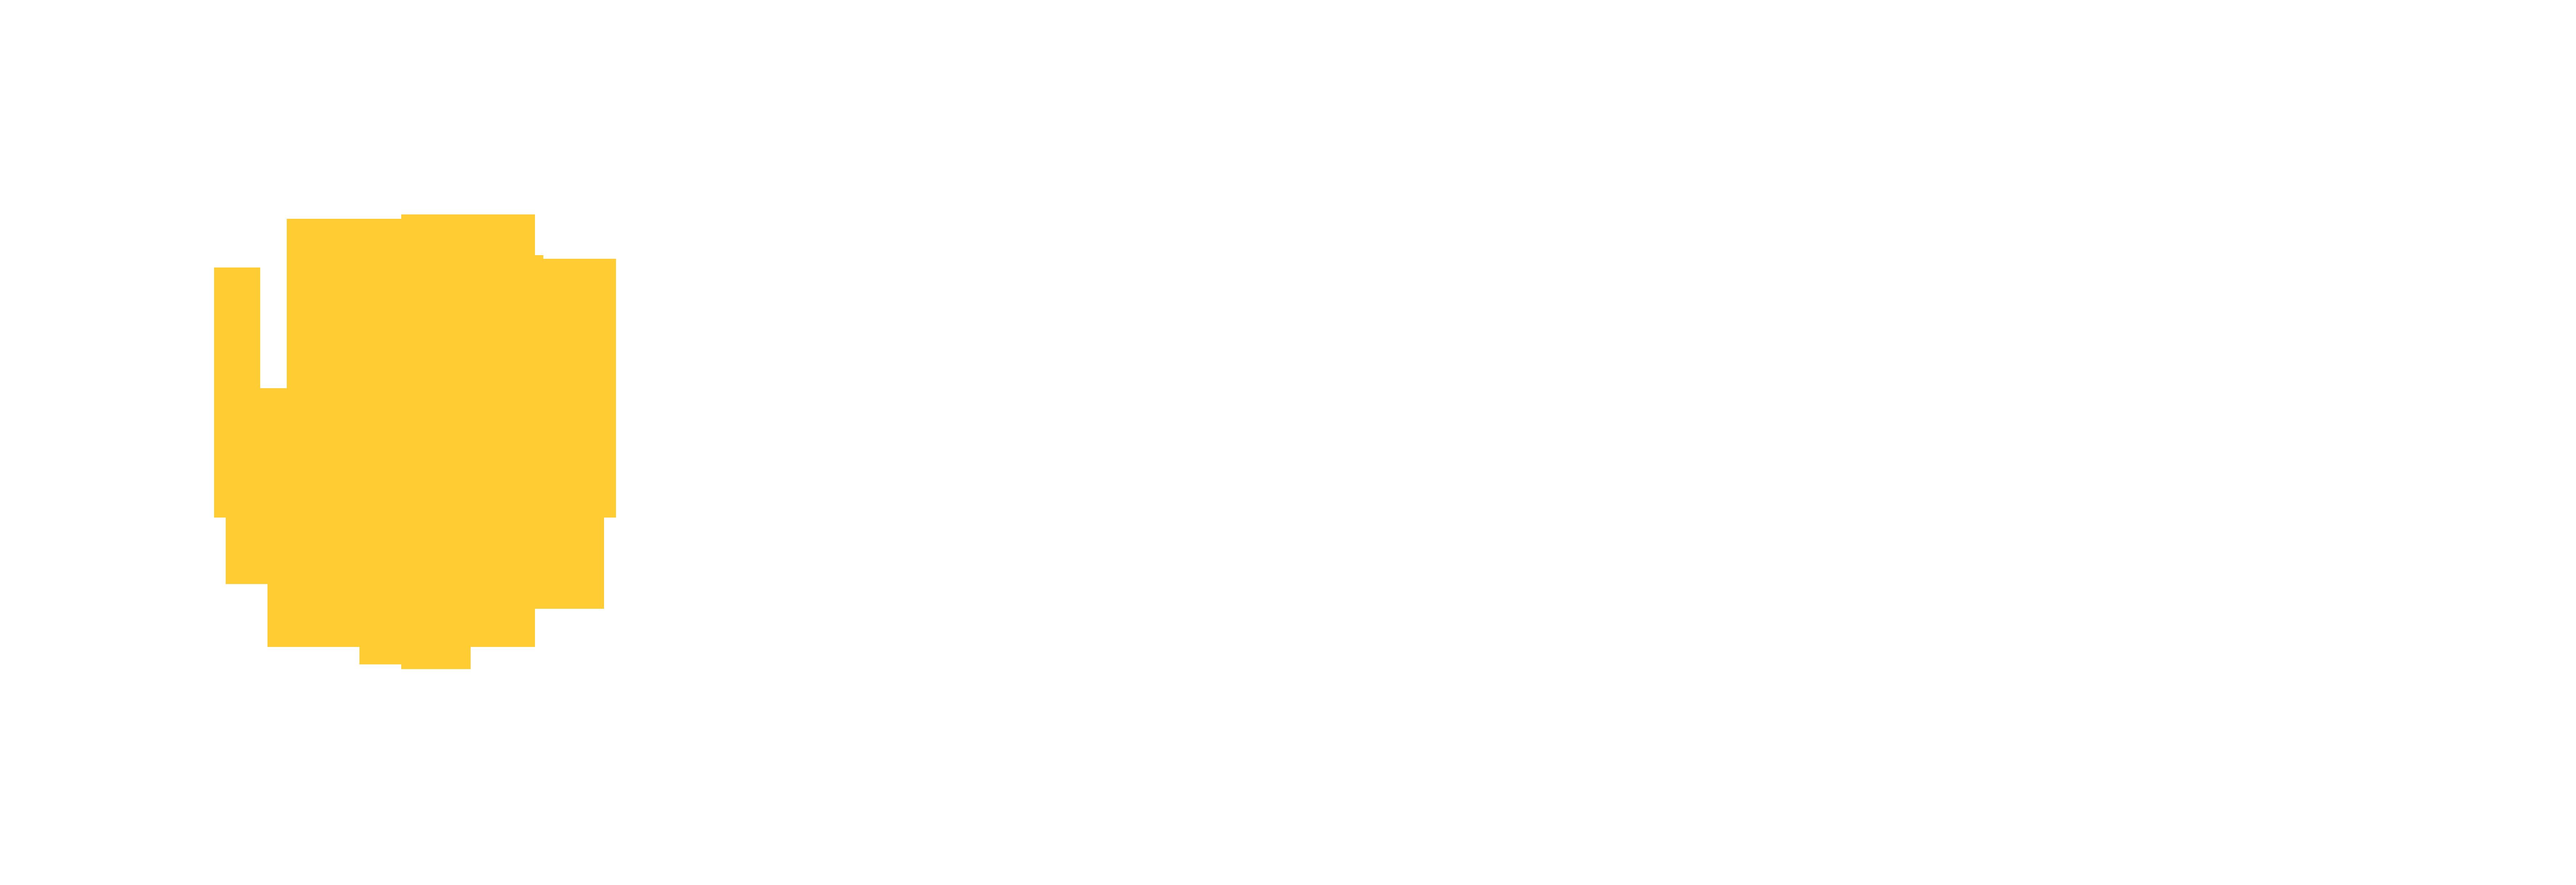 Uncommon Sports Group logo